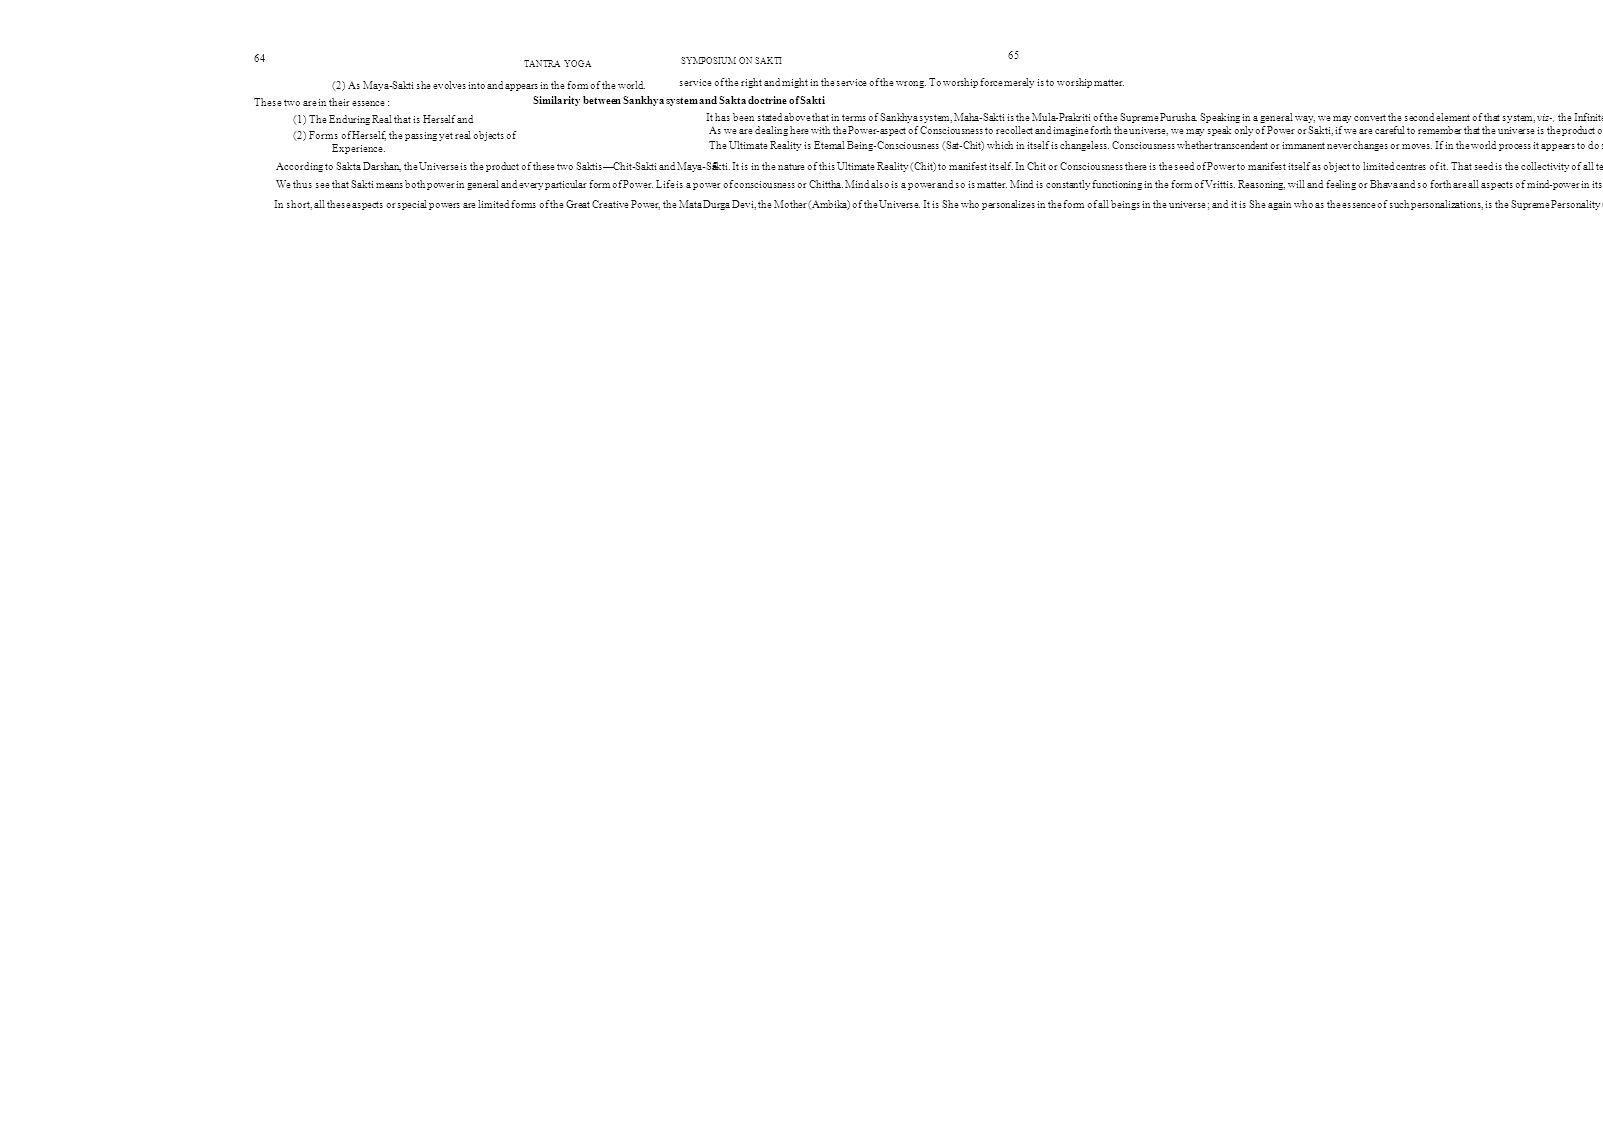 Similarity between Sankhya system and Sakta doctrine of Sakti